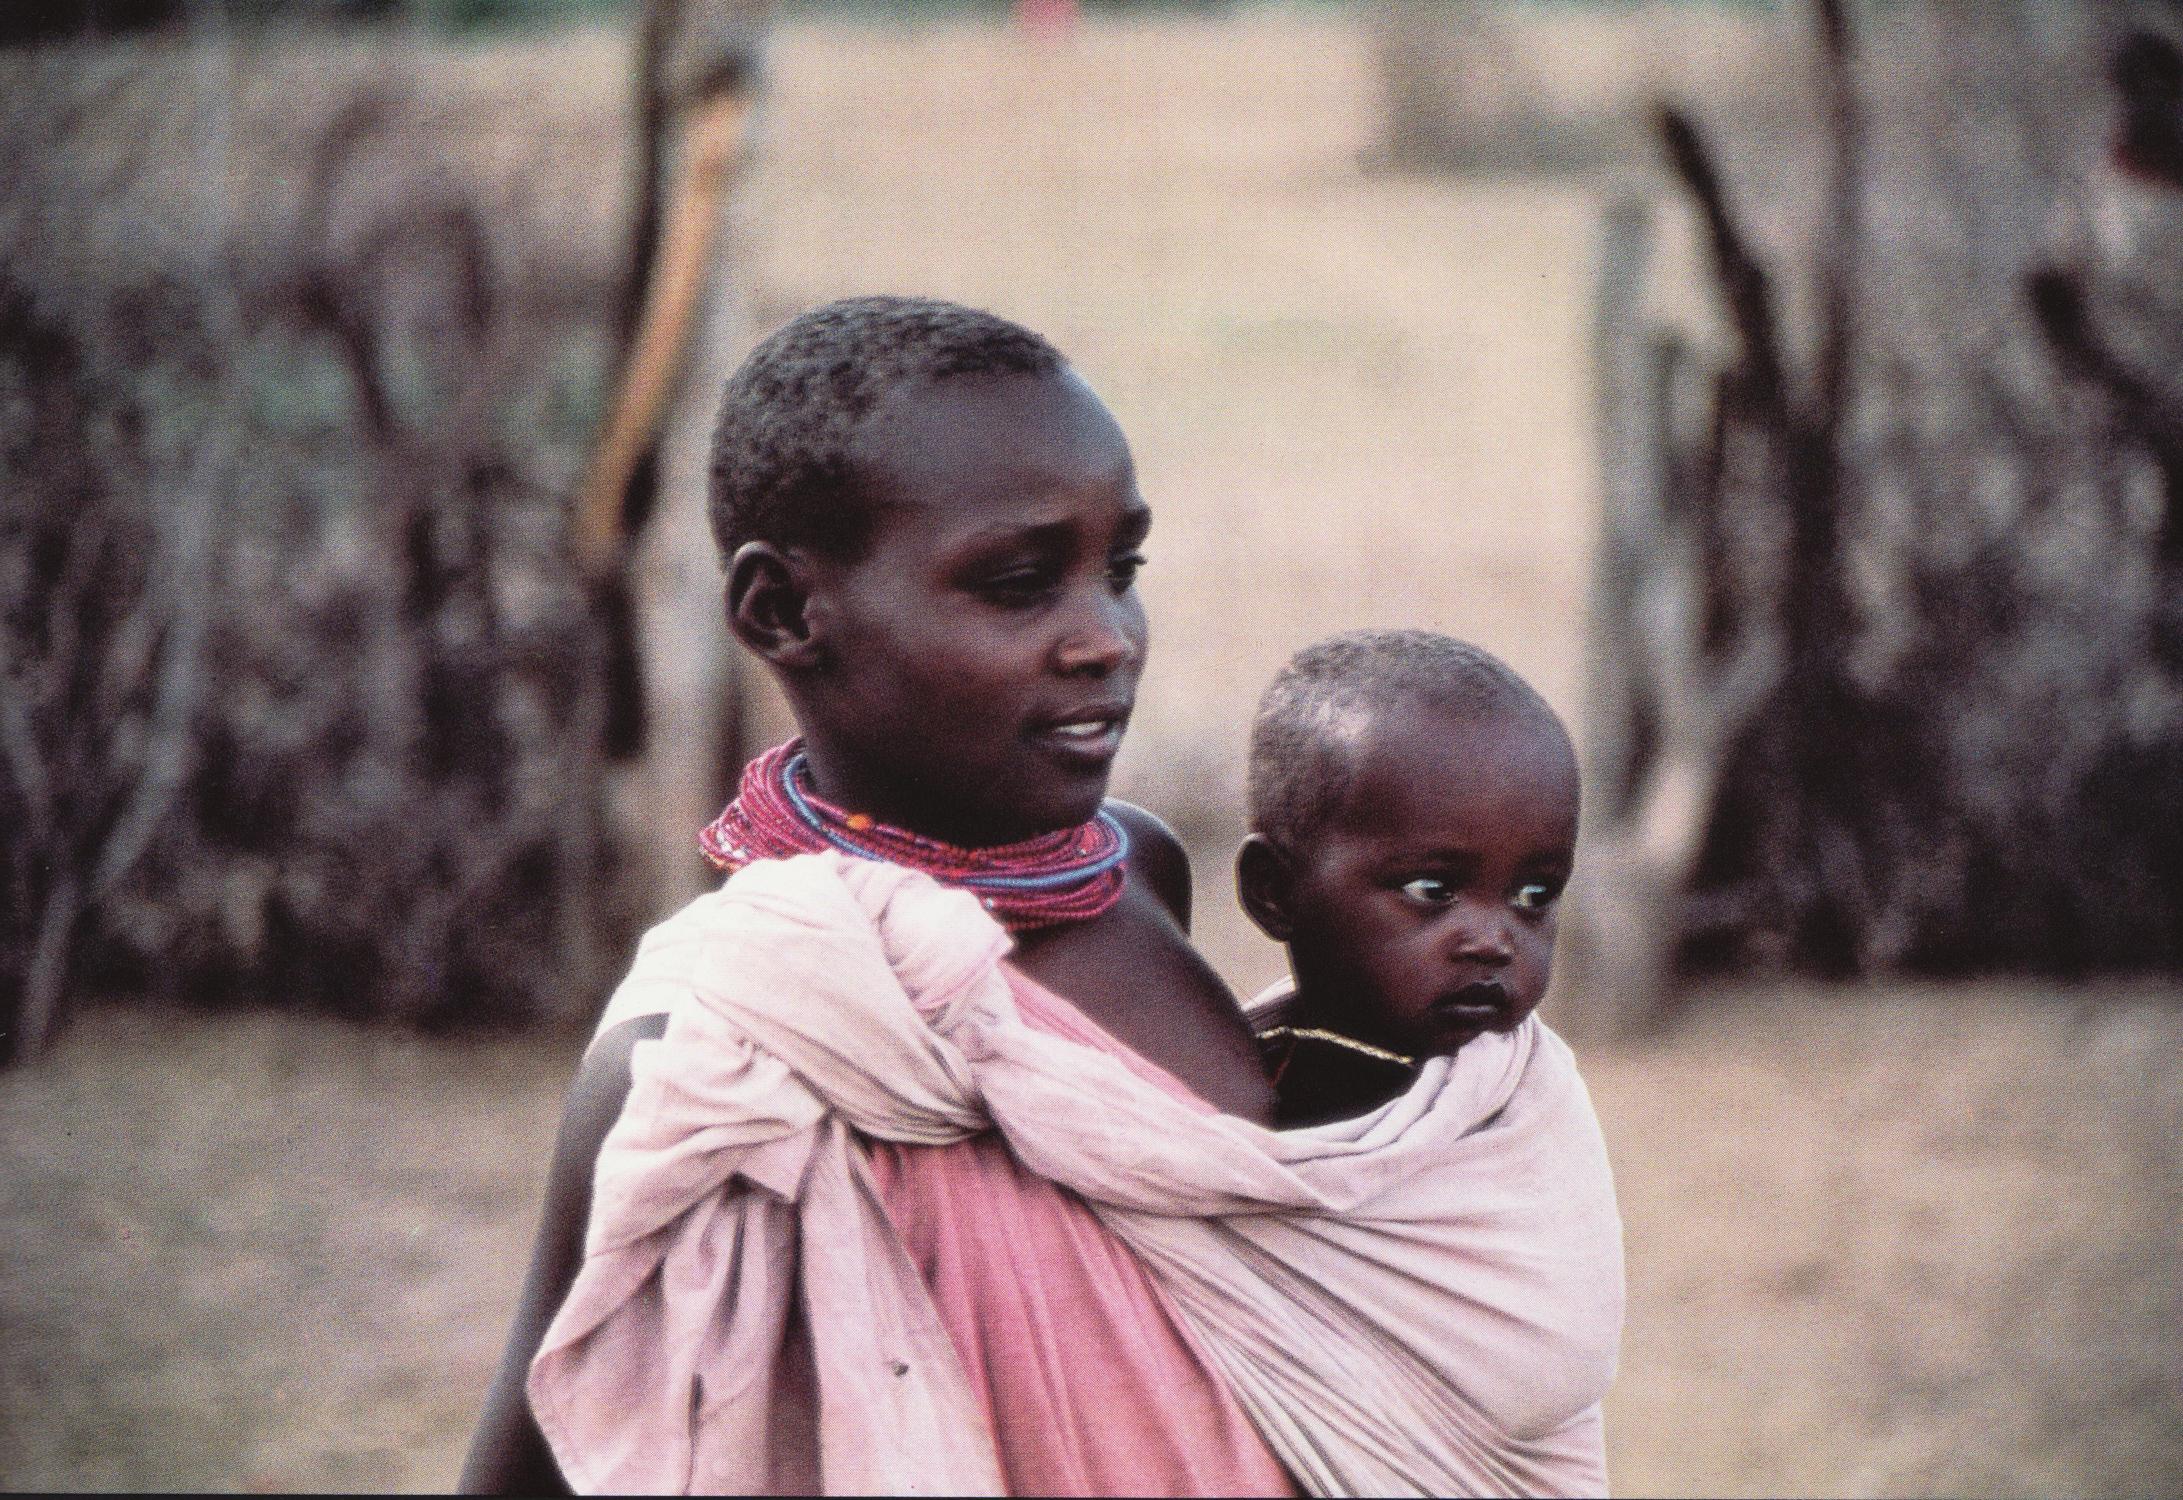 03, Rift Valley, Kenya